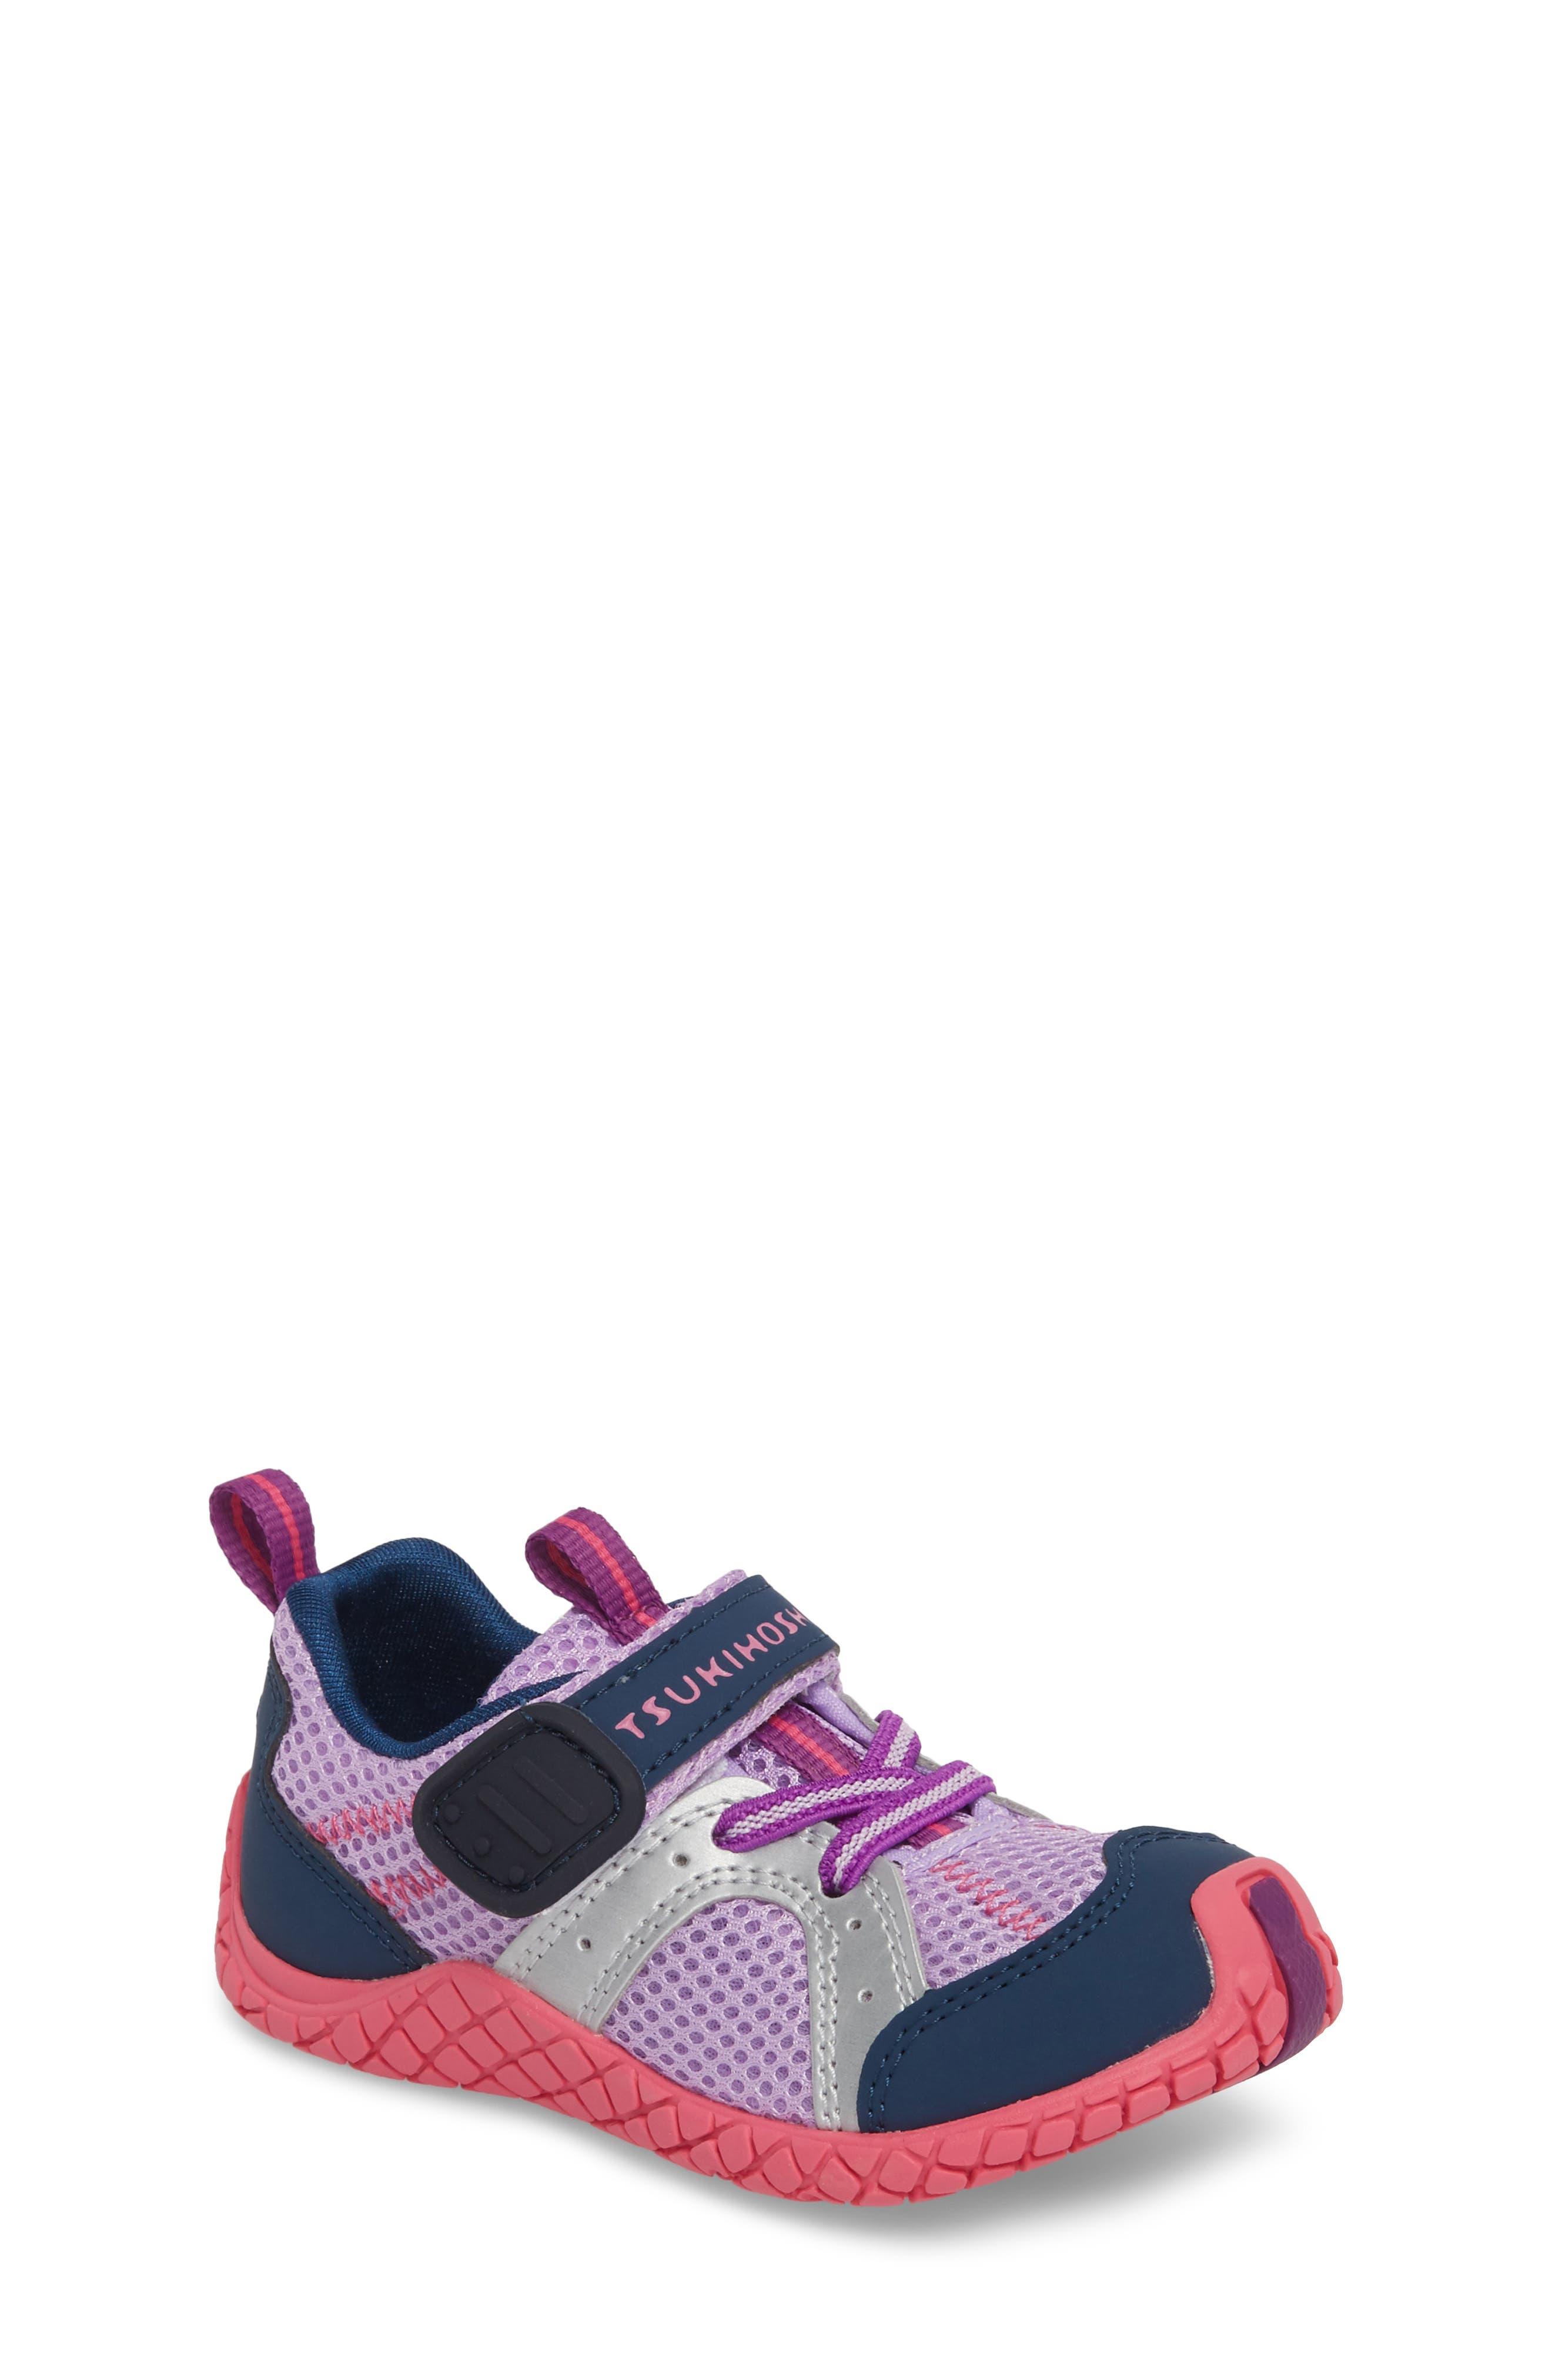 Tsukihoshi Marina Washable Sneaker (Baby, Walker, Toddler & Little Kid)